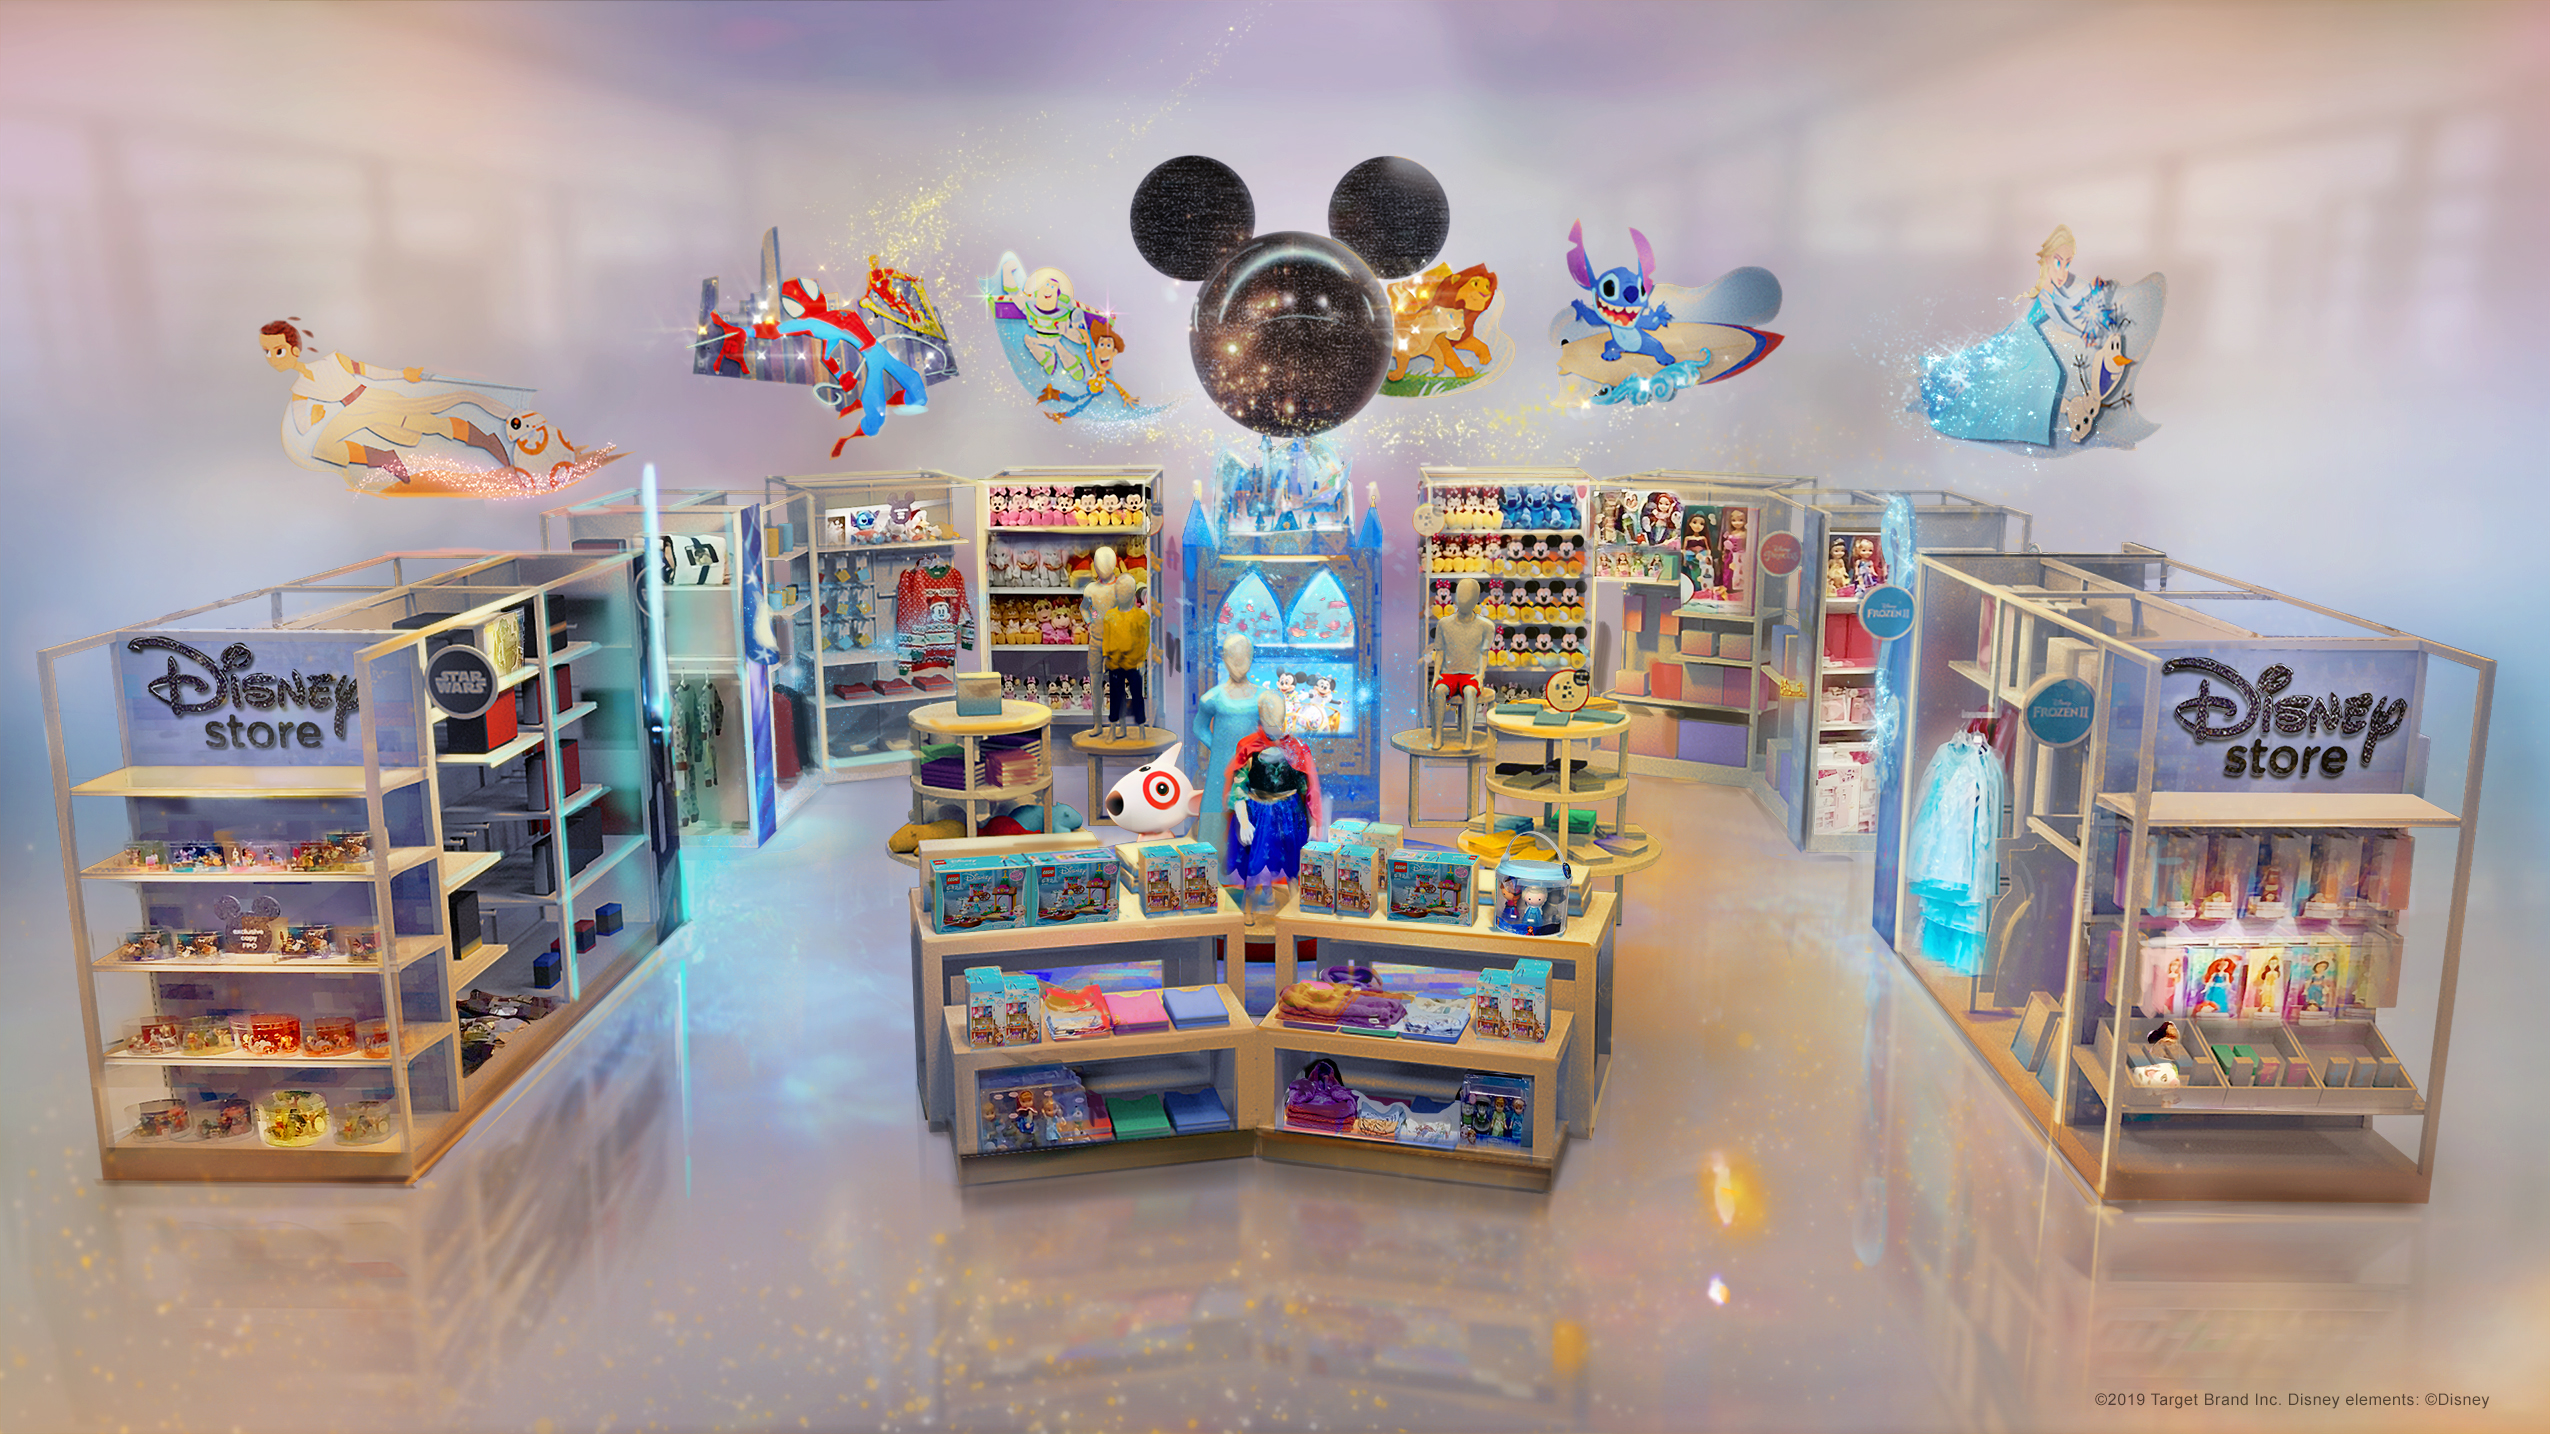 New Disney Stores Inside Target Shops Bring Extra Magic 1